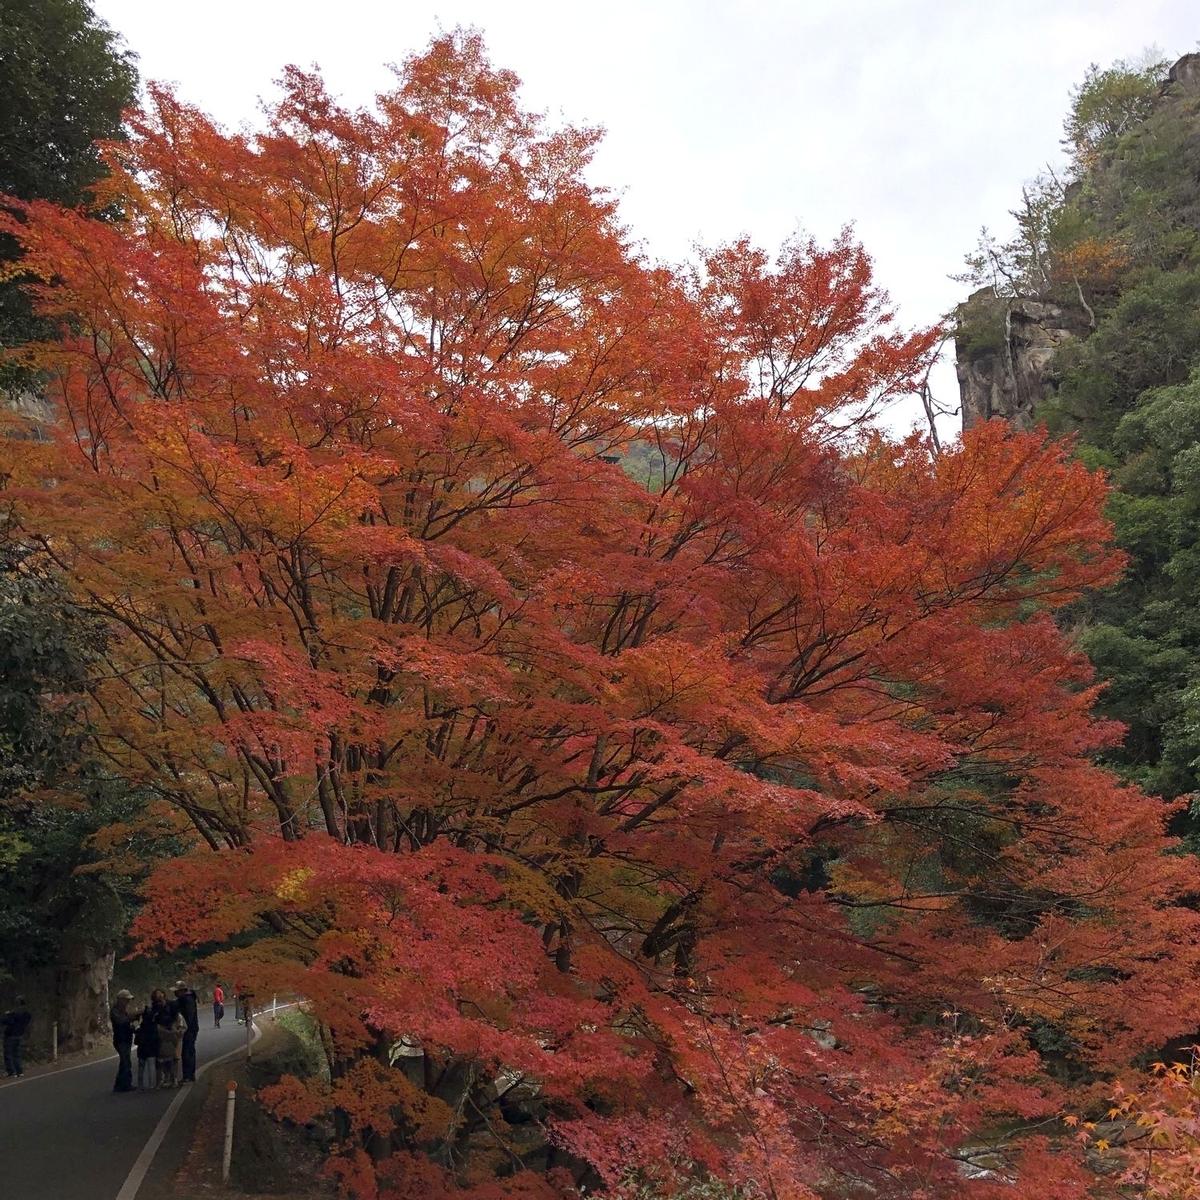 f:id:shiratsume:20191125201006j:plain